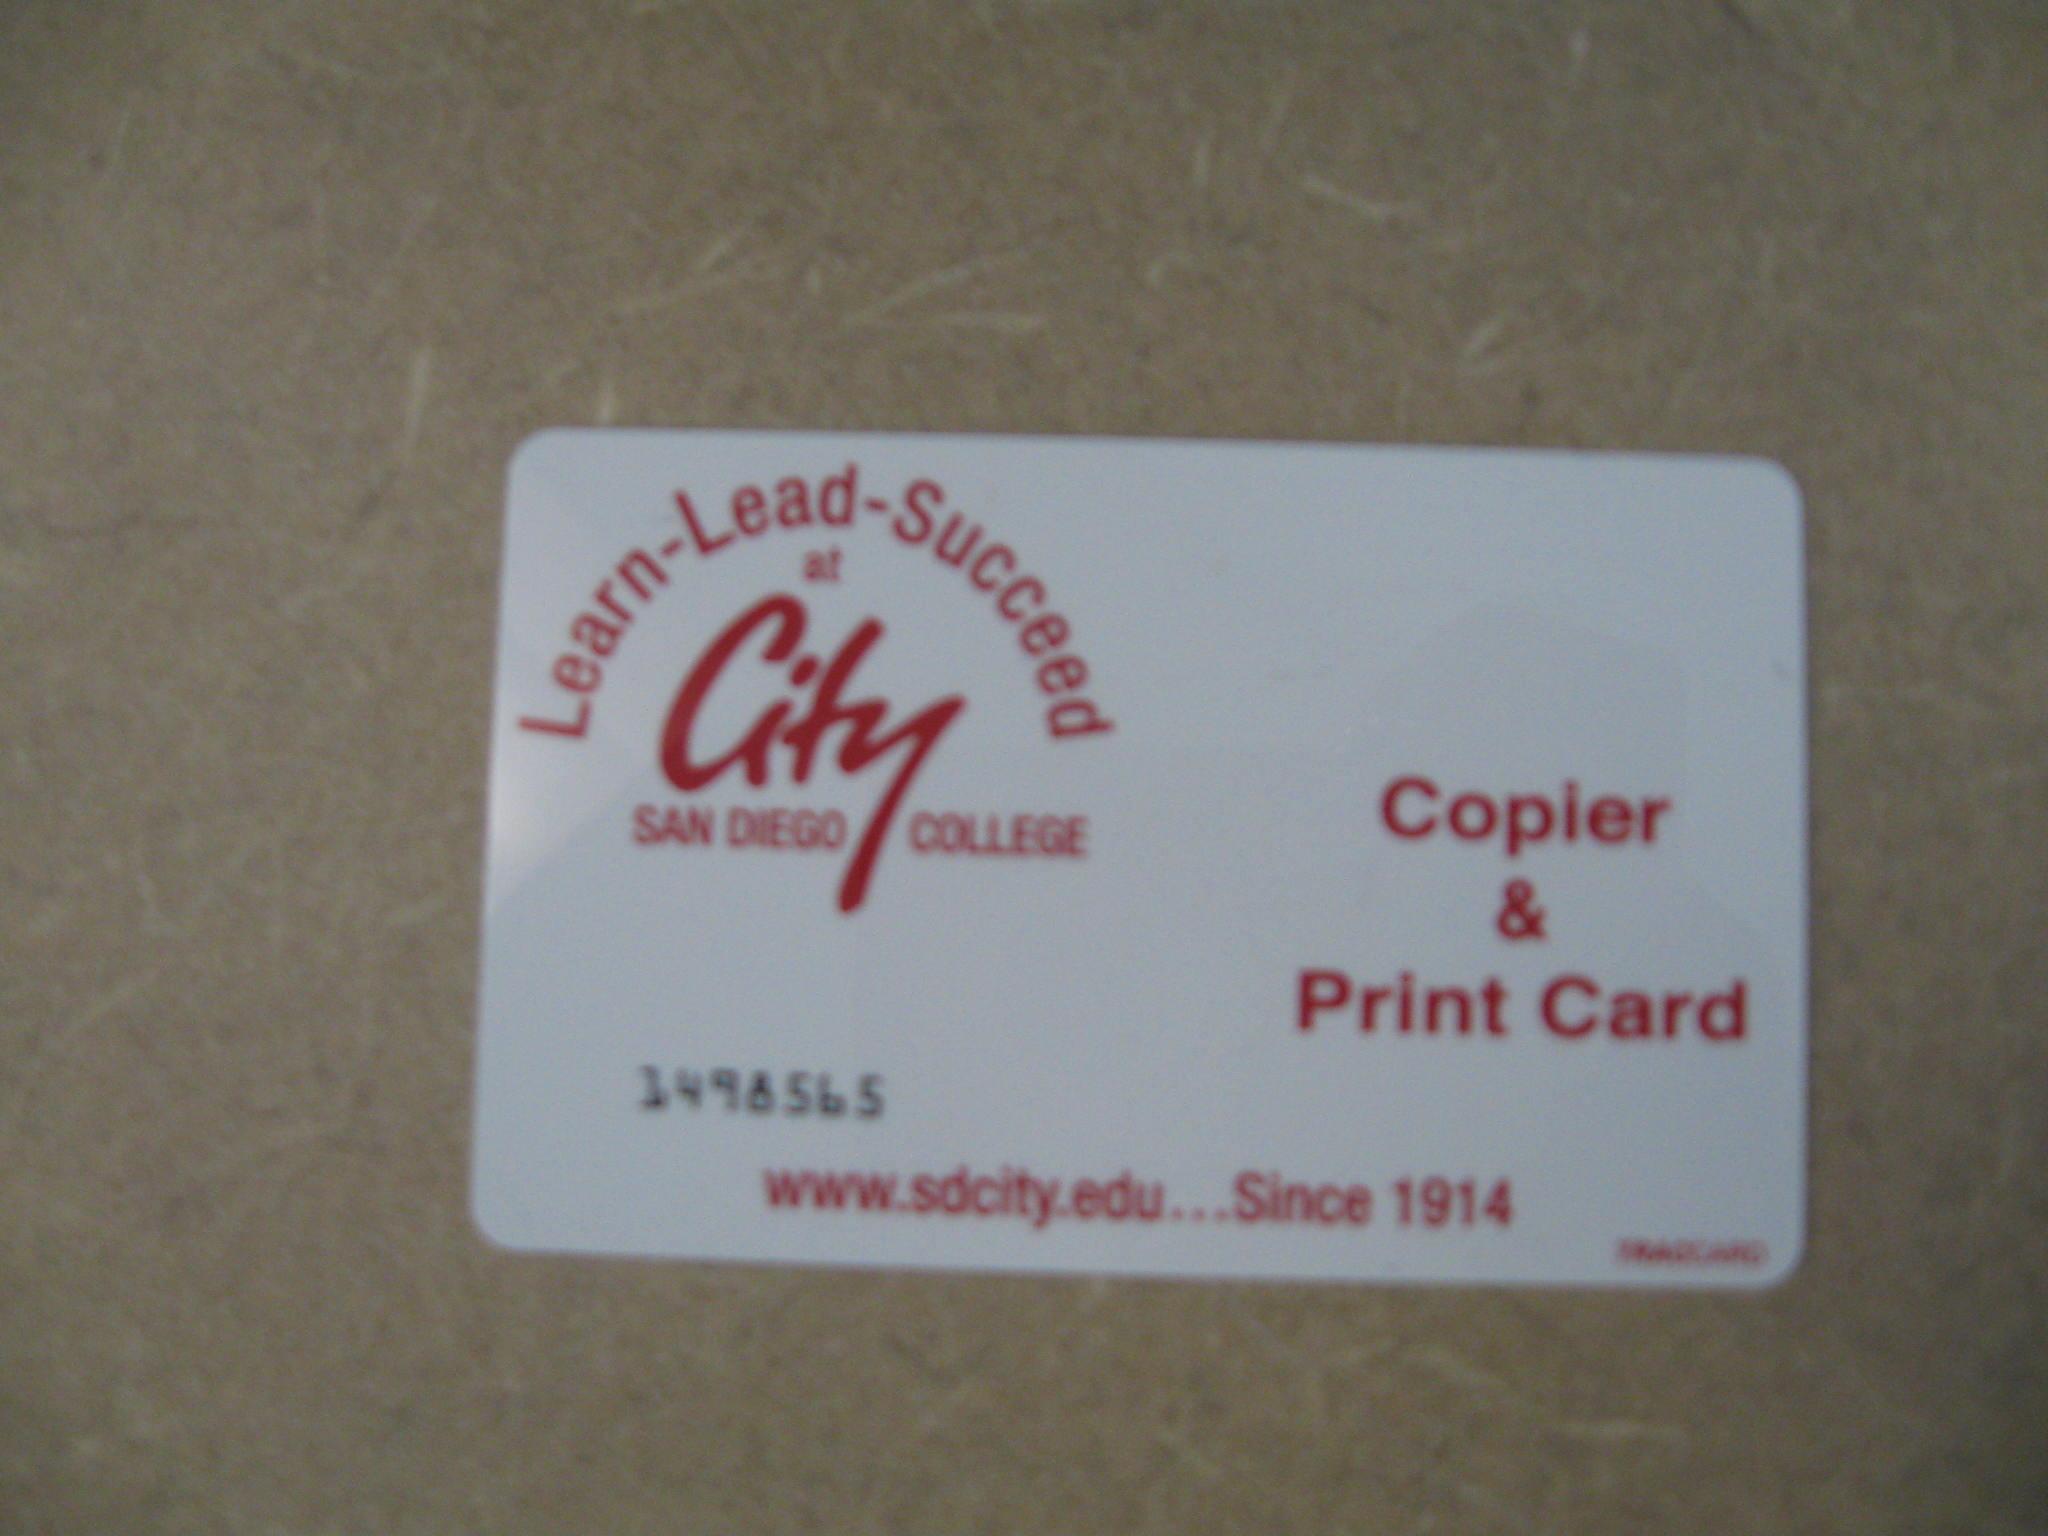 Print/Copy card